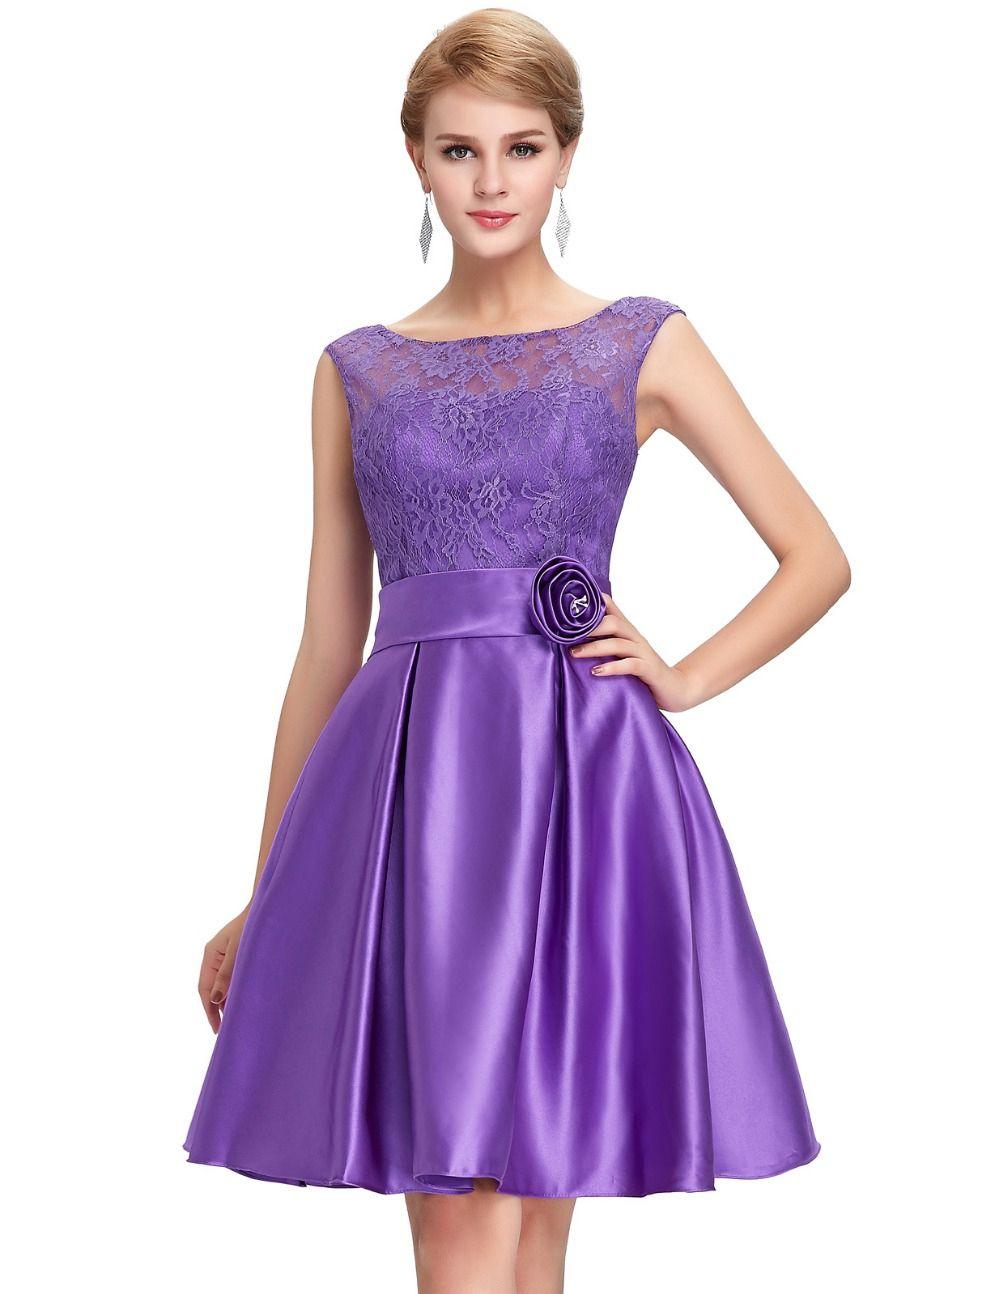 Short evening dresses for weddings womenus dresses for weddings